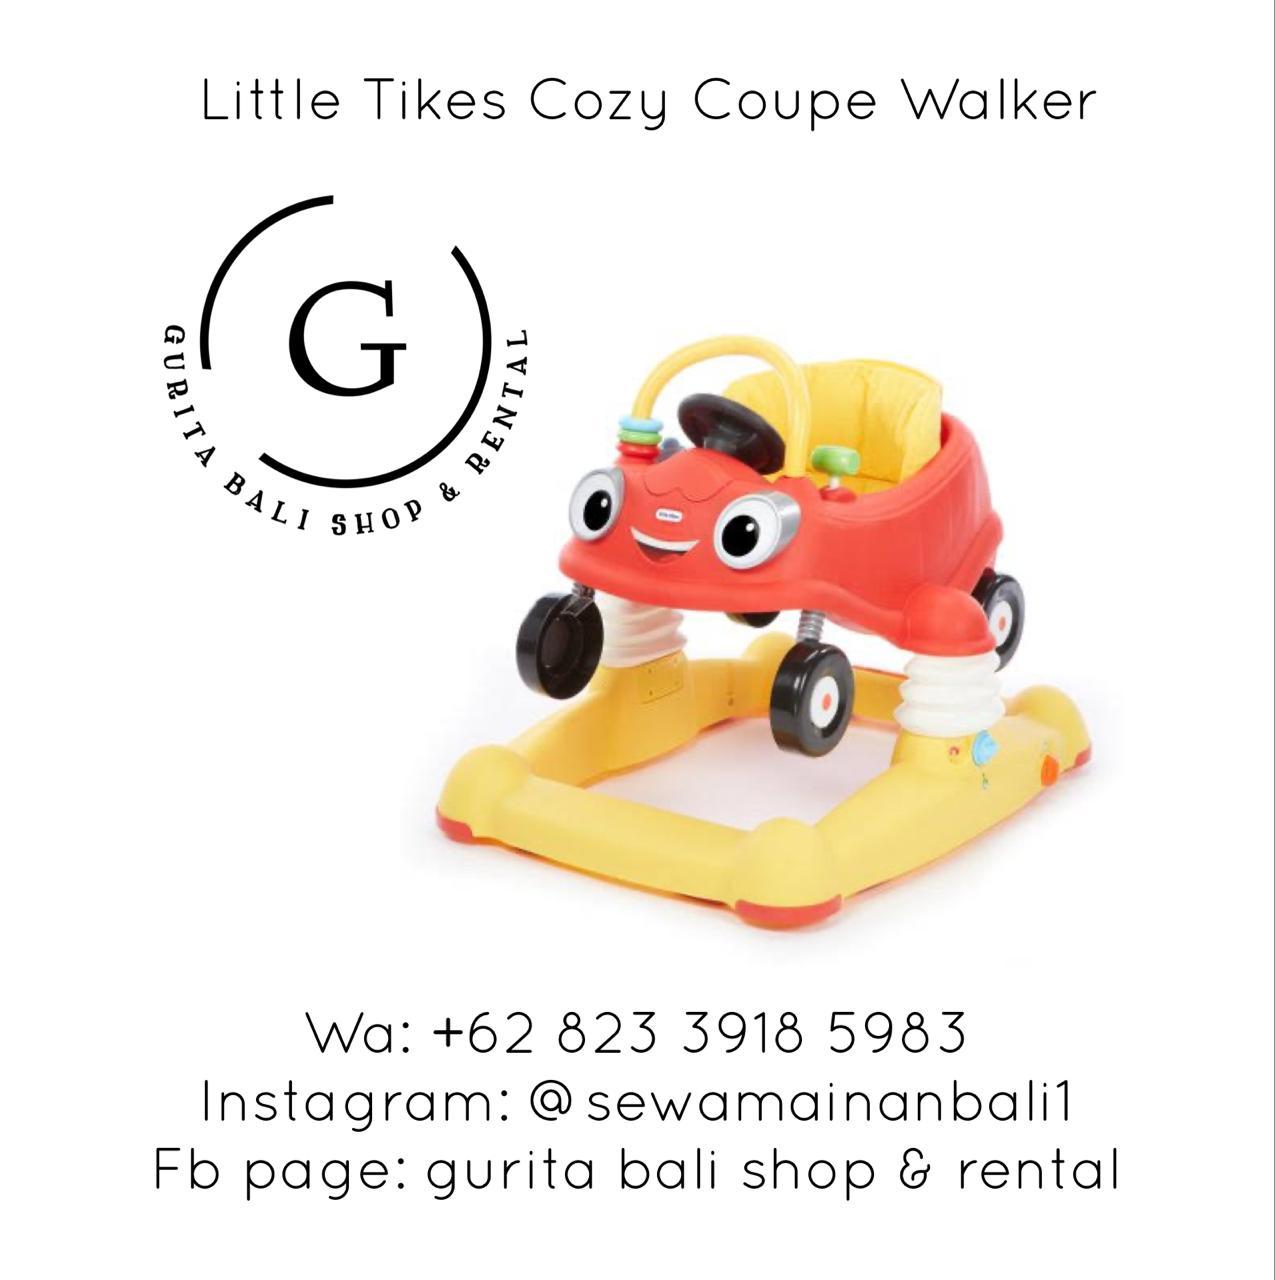 LITTLE TIKES COZY COUPE WALKER